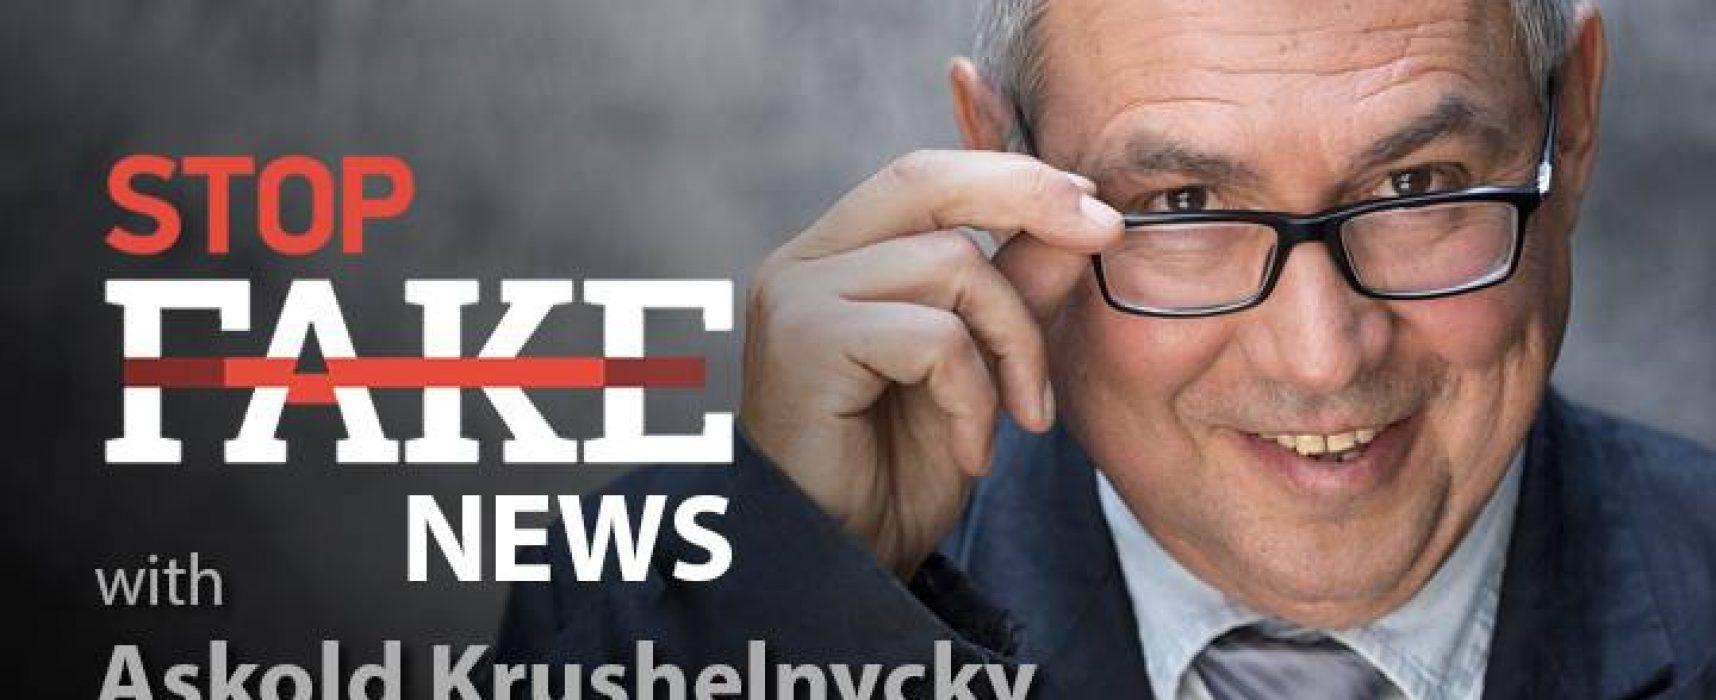 StopFakeNews #92 [Engels] met Askold Krushelnycky